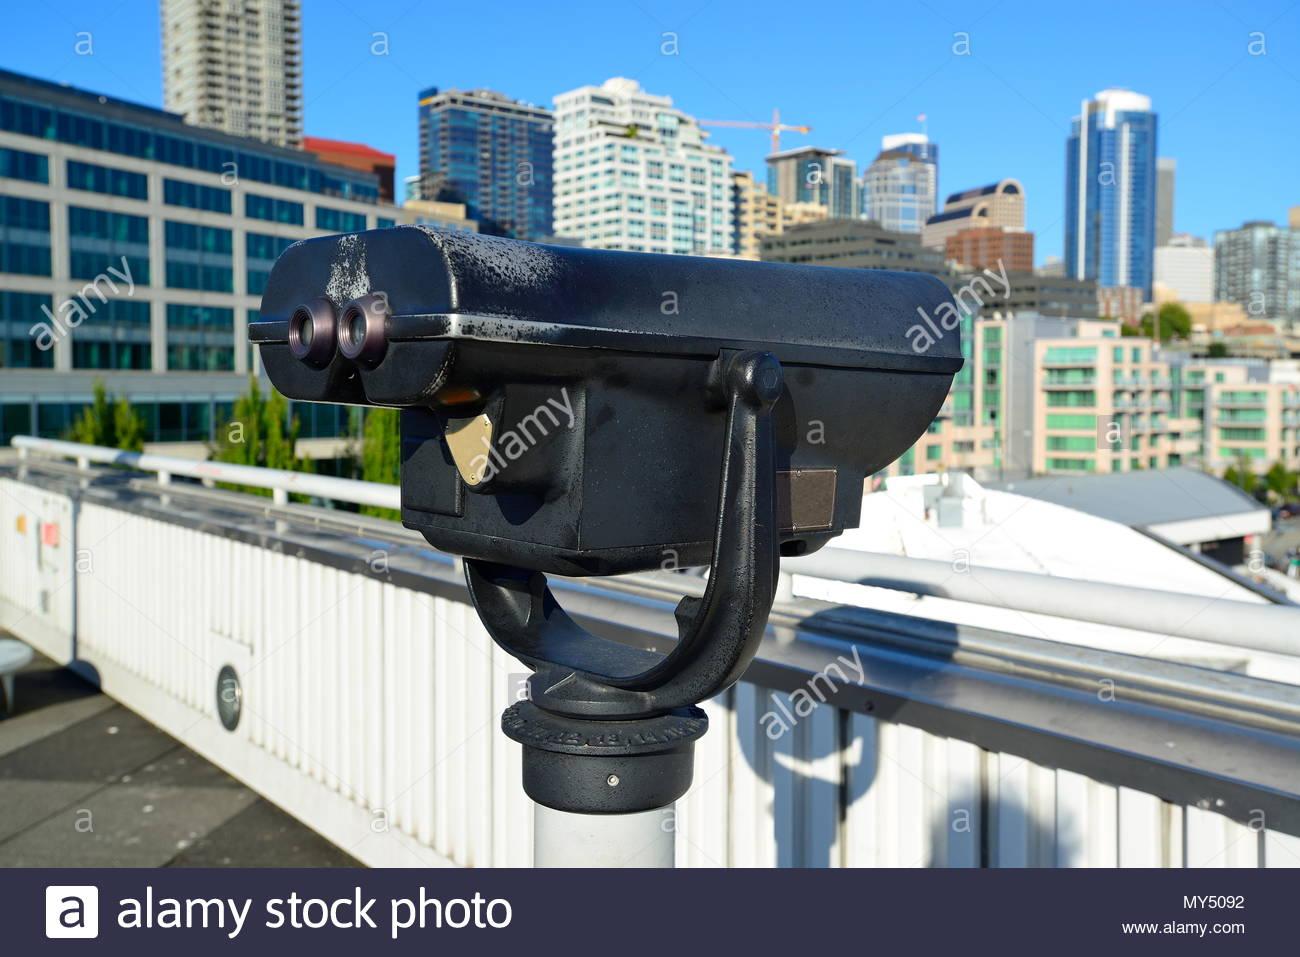 City Binocular - Stock Image